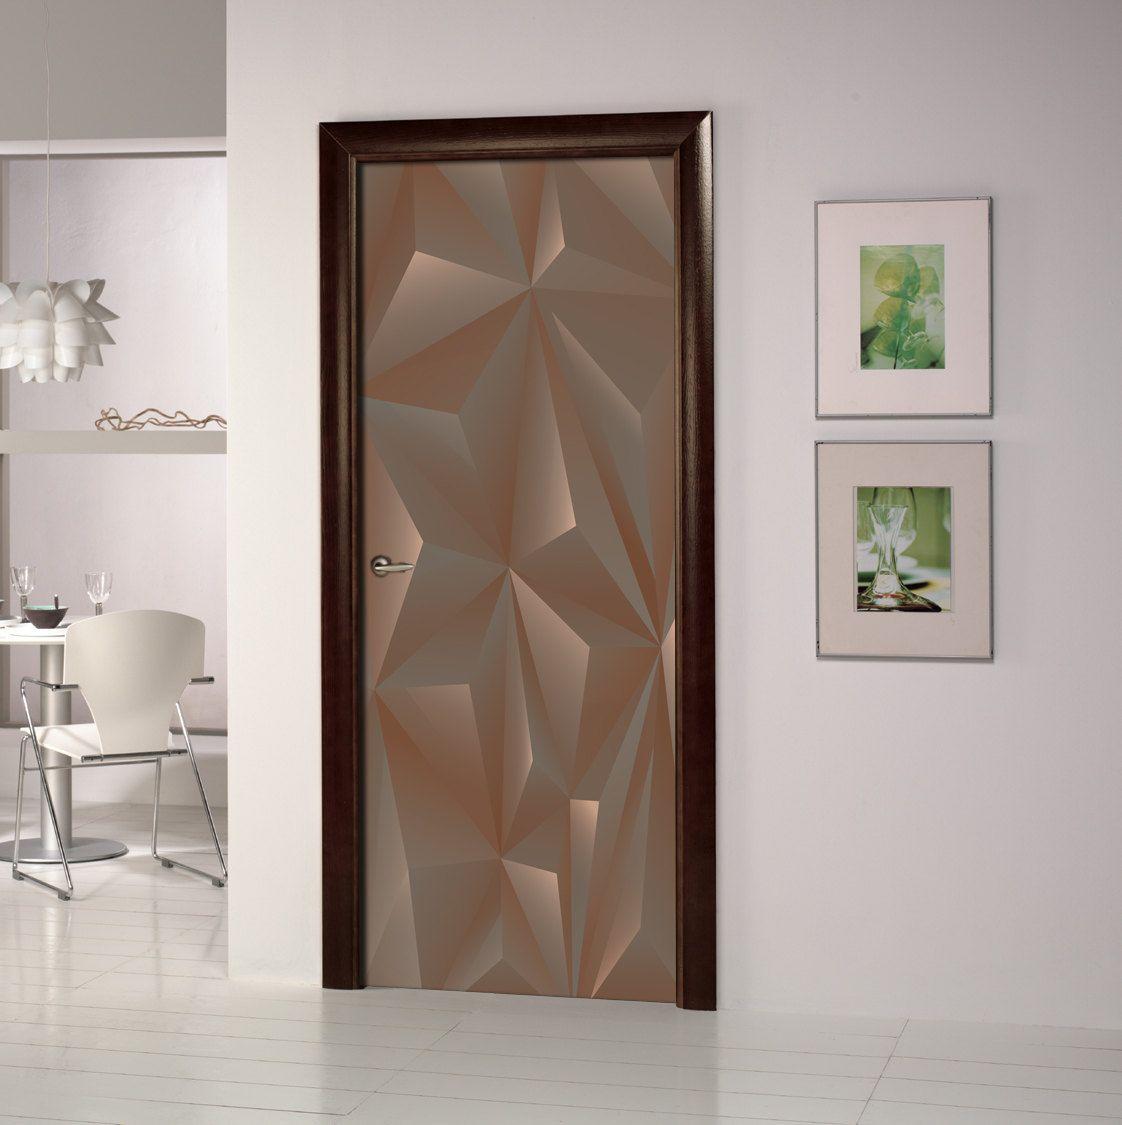 Door wall sticker - 3D Self-Adhesive Vinyl Mural - Self Adhesive Peel &  Stick